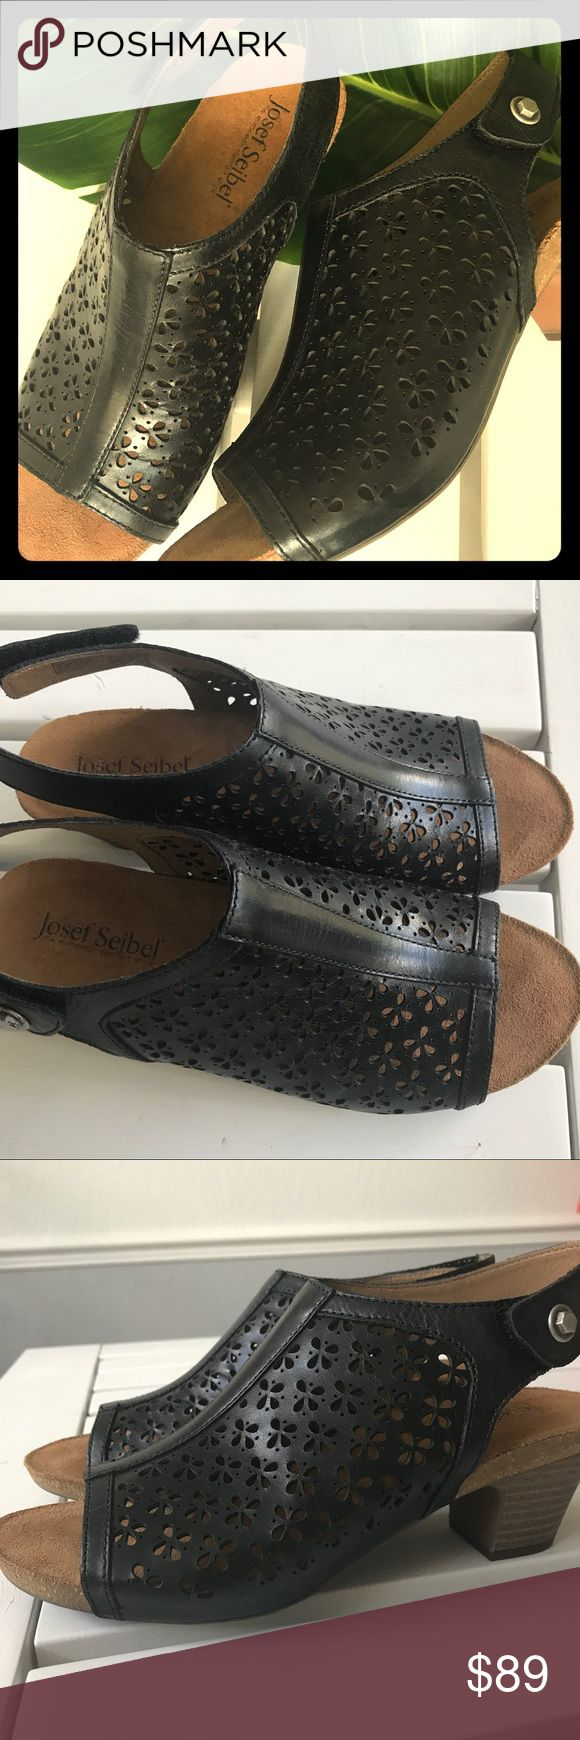 🌴NEW JOSEF SEIBEL SANDALS🌴 Never worn, Josef Seibel, made in Germany. Styke, Ruth 33 Laser-Cut Leather Sandals. Super stylish but very comfy❤️ Josef Seibel Shoes Sandals